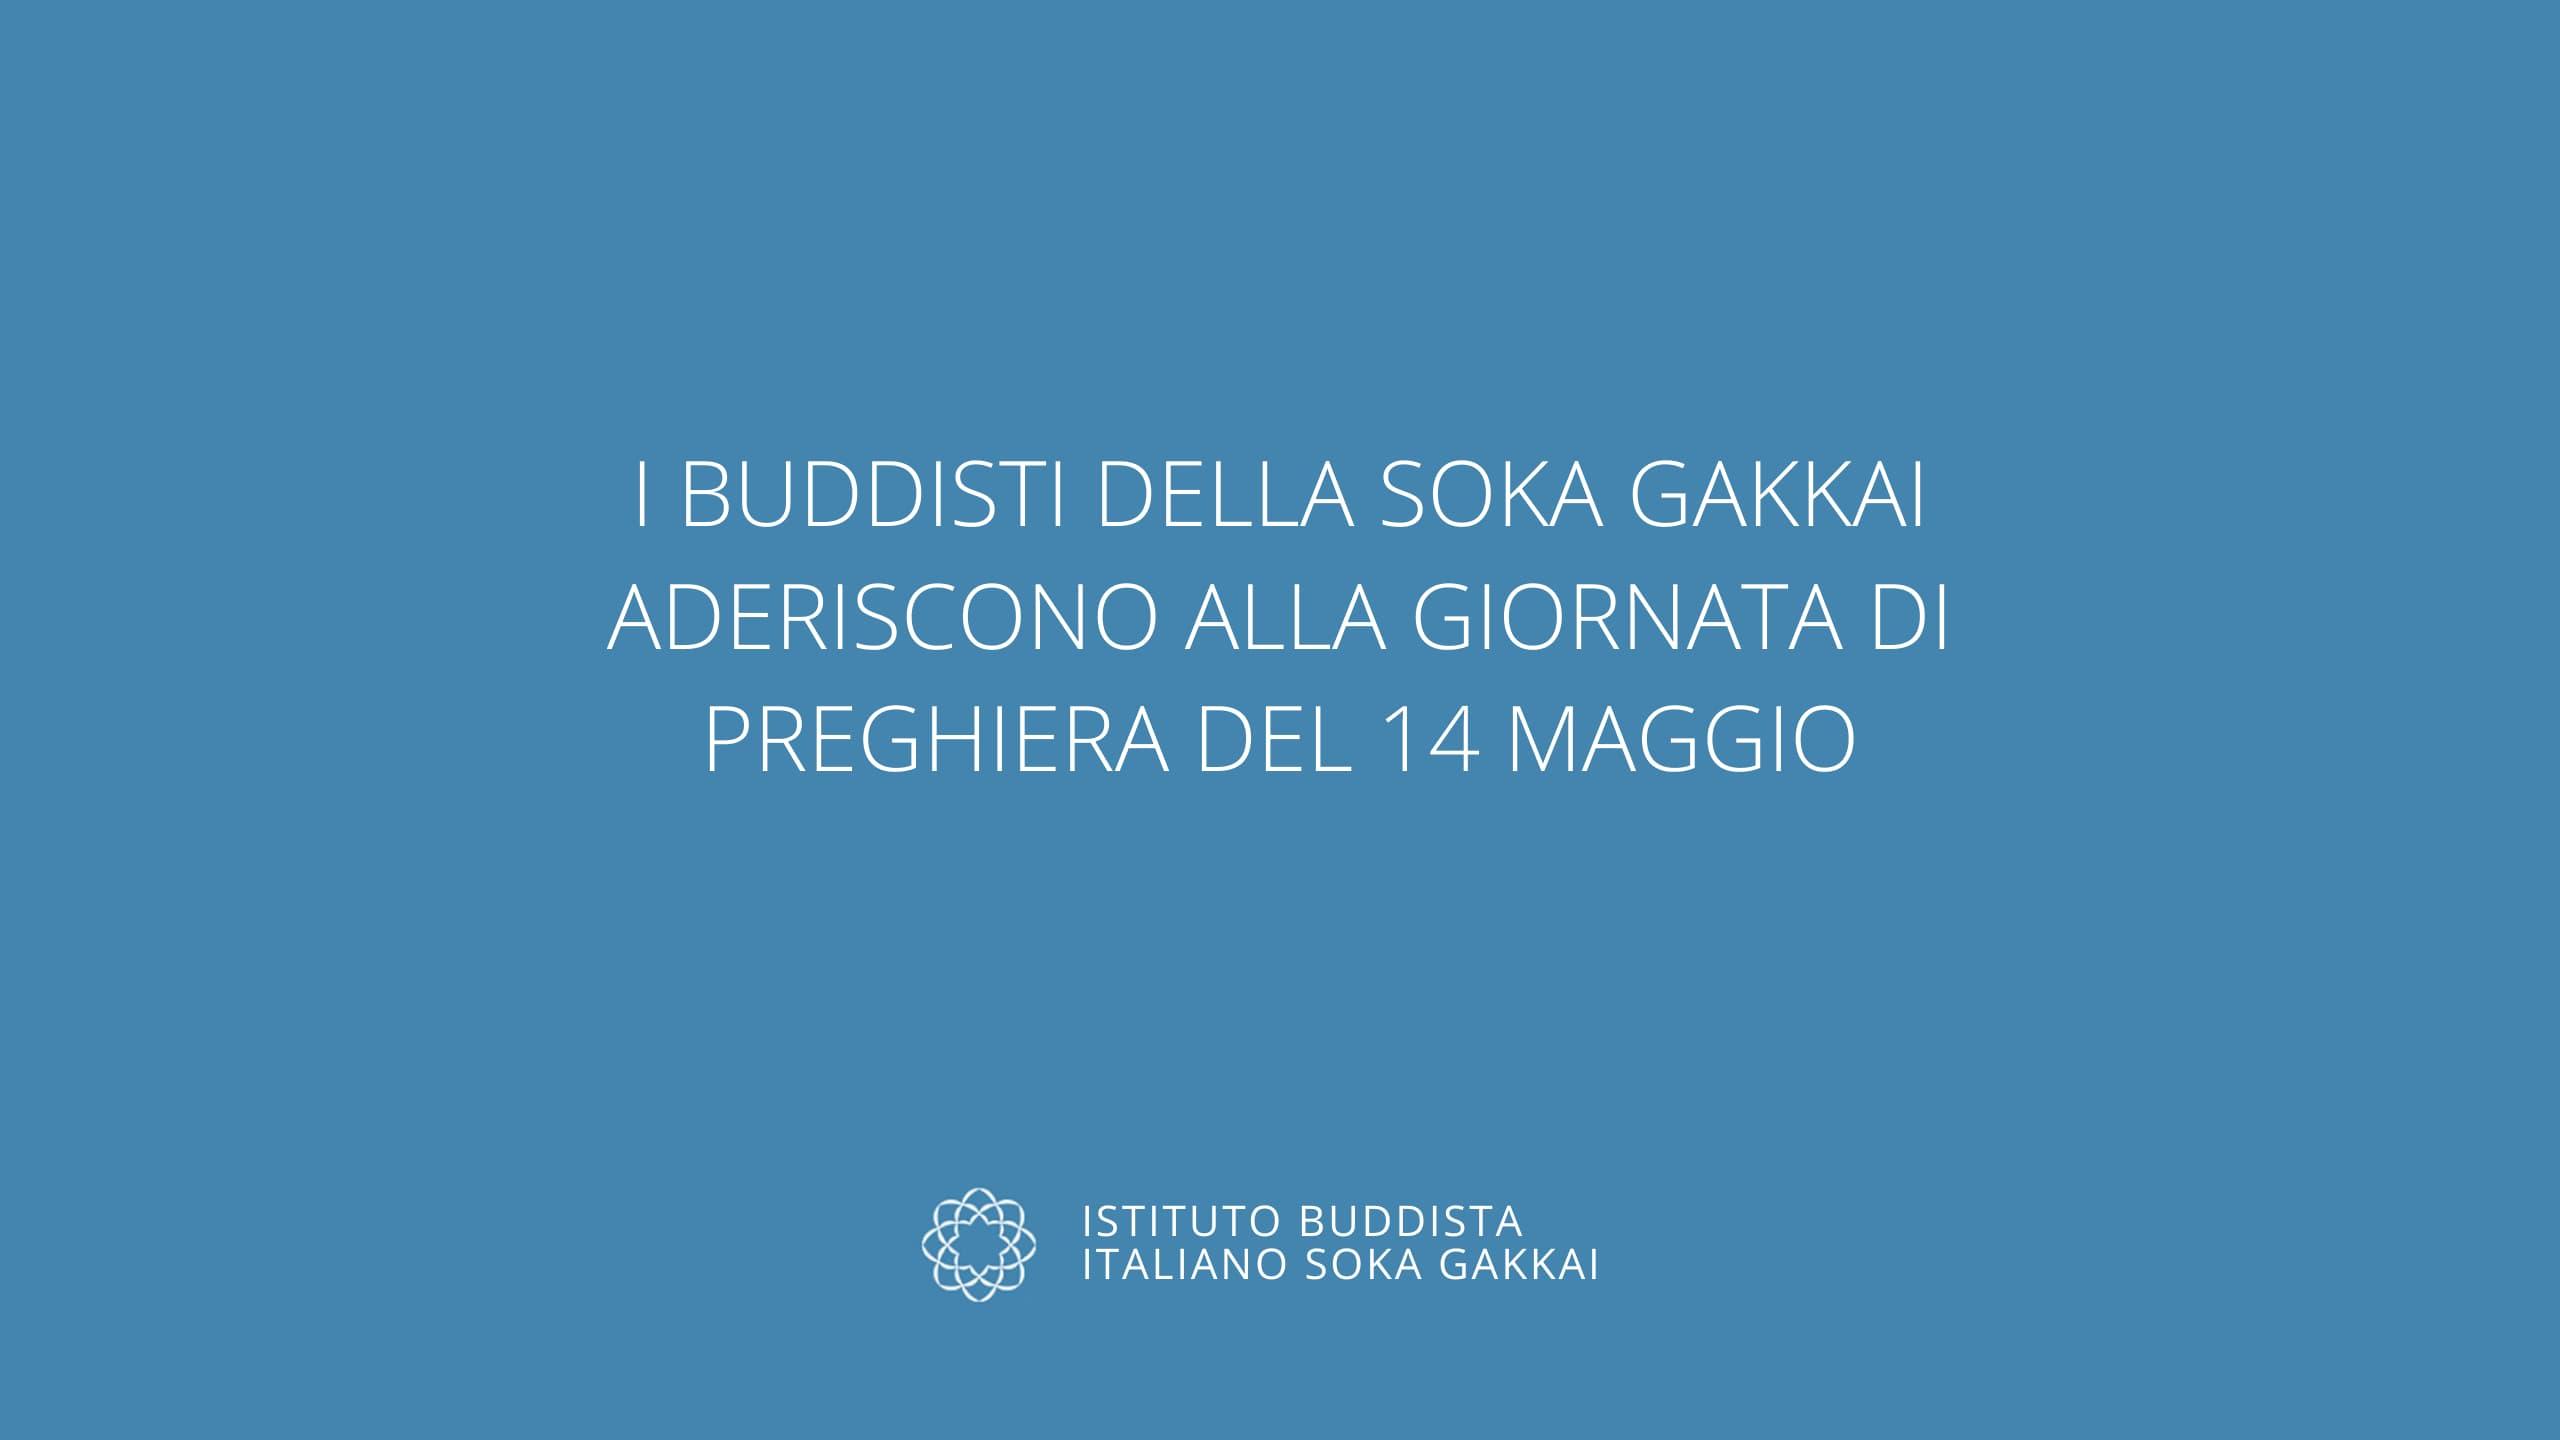 Buddisti Soka Gakkai 14 maggio